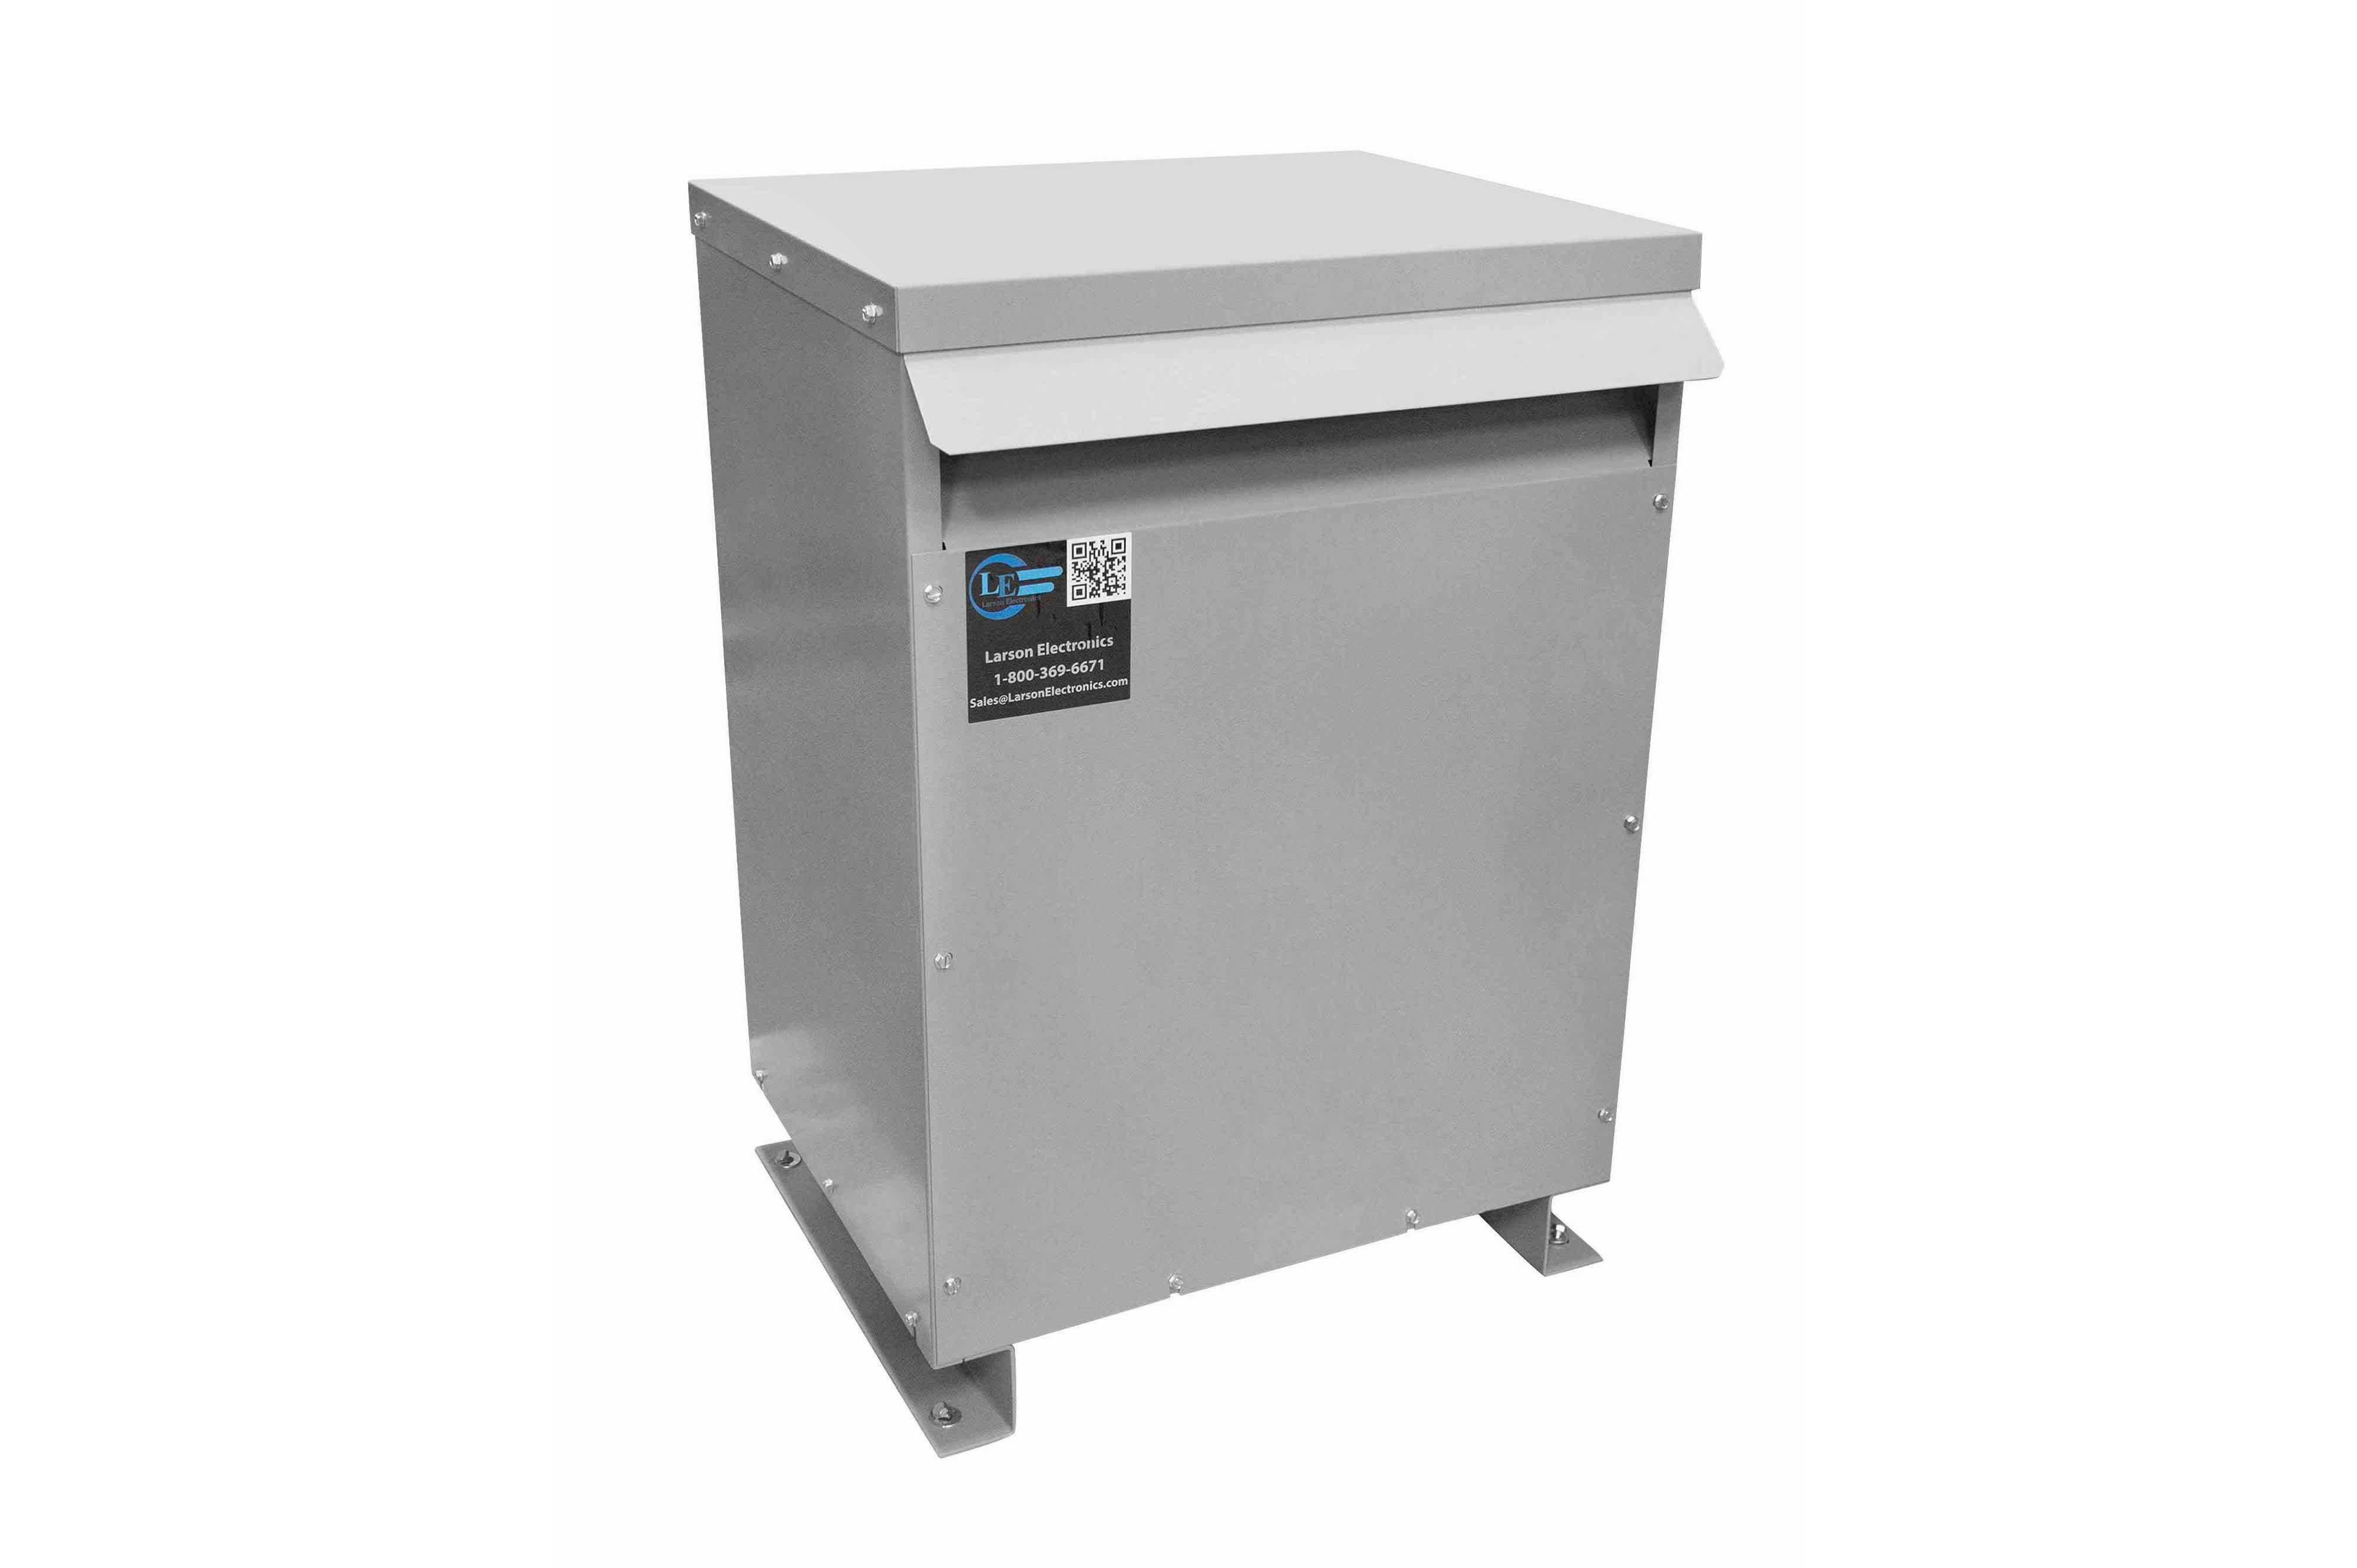 125 kVA 3PH Isolation Transformer, 460V Wye Primary, 240V Delta Secondary, N3R, Ventilated, 60 Hz